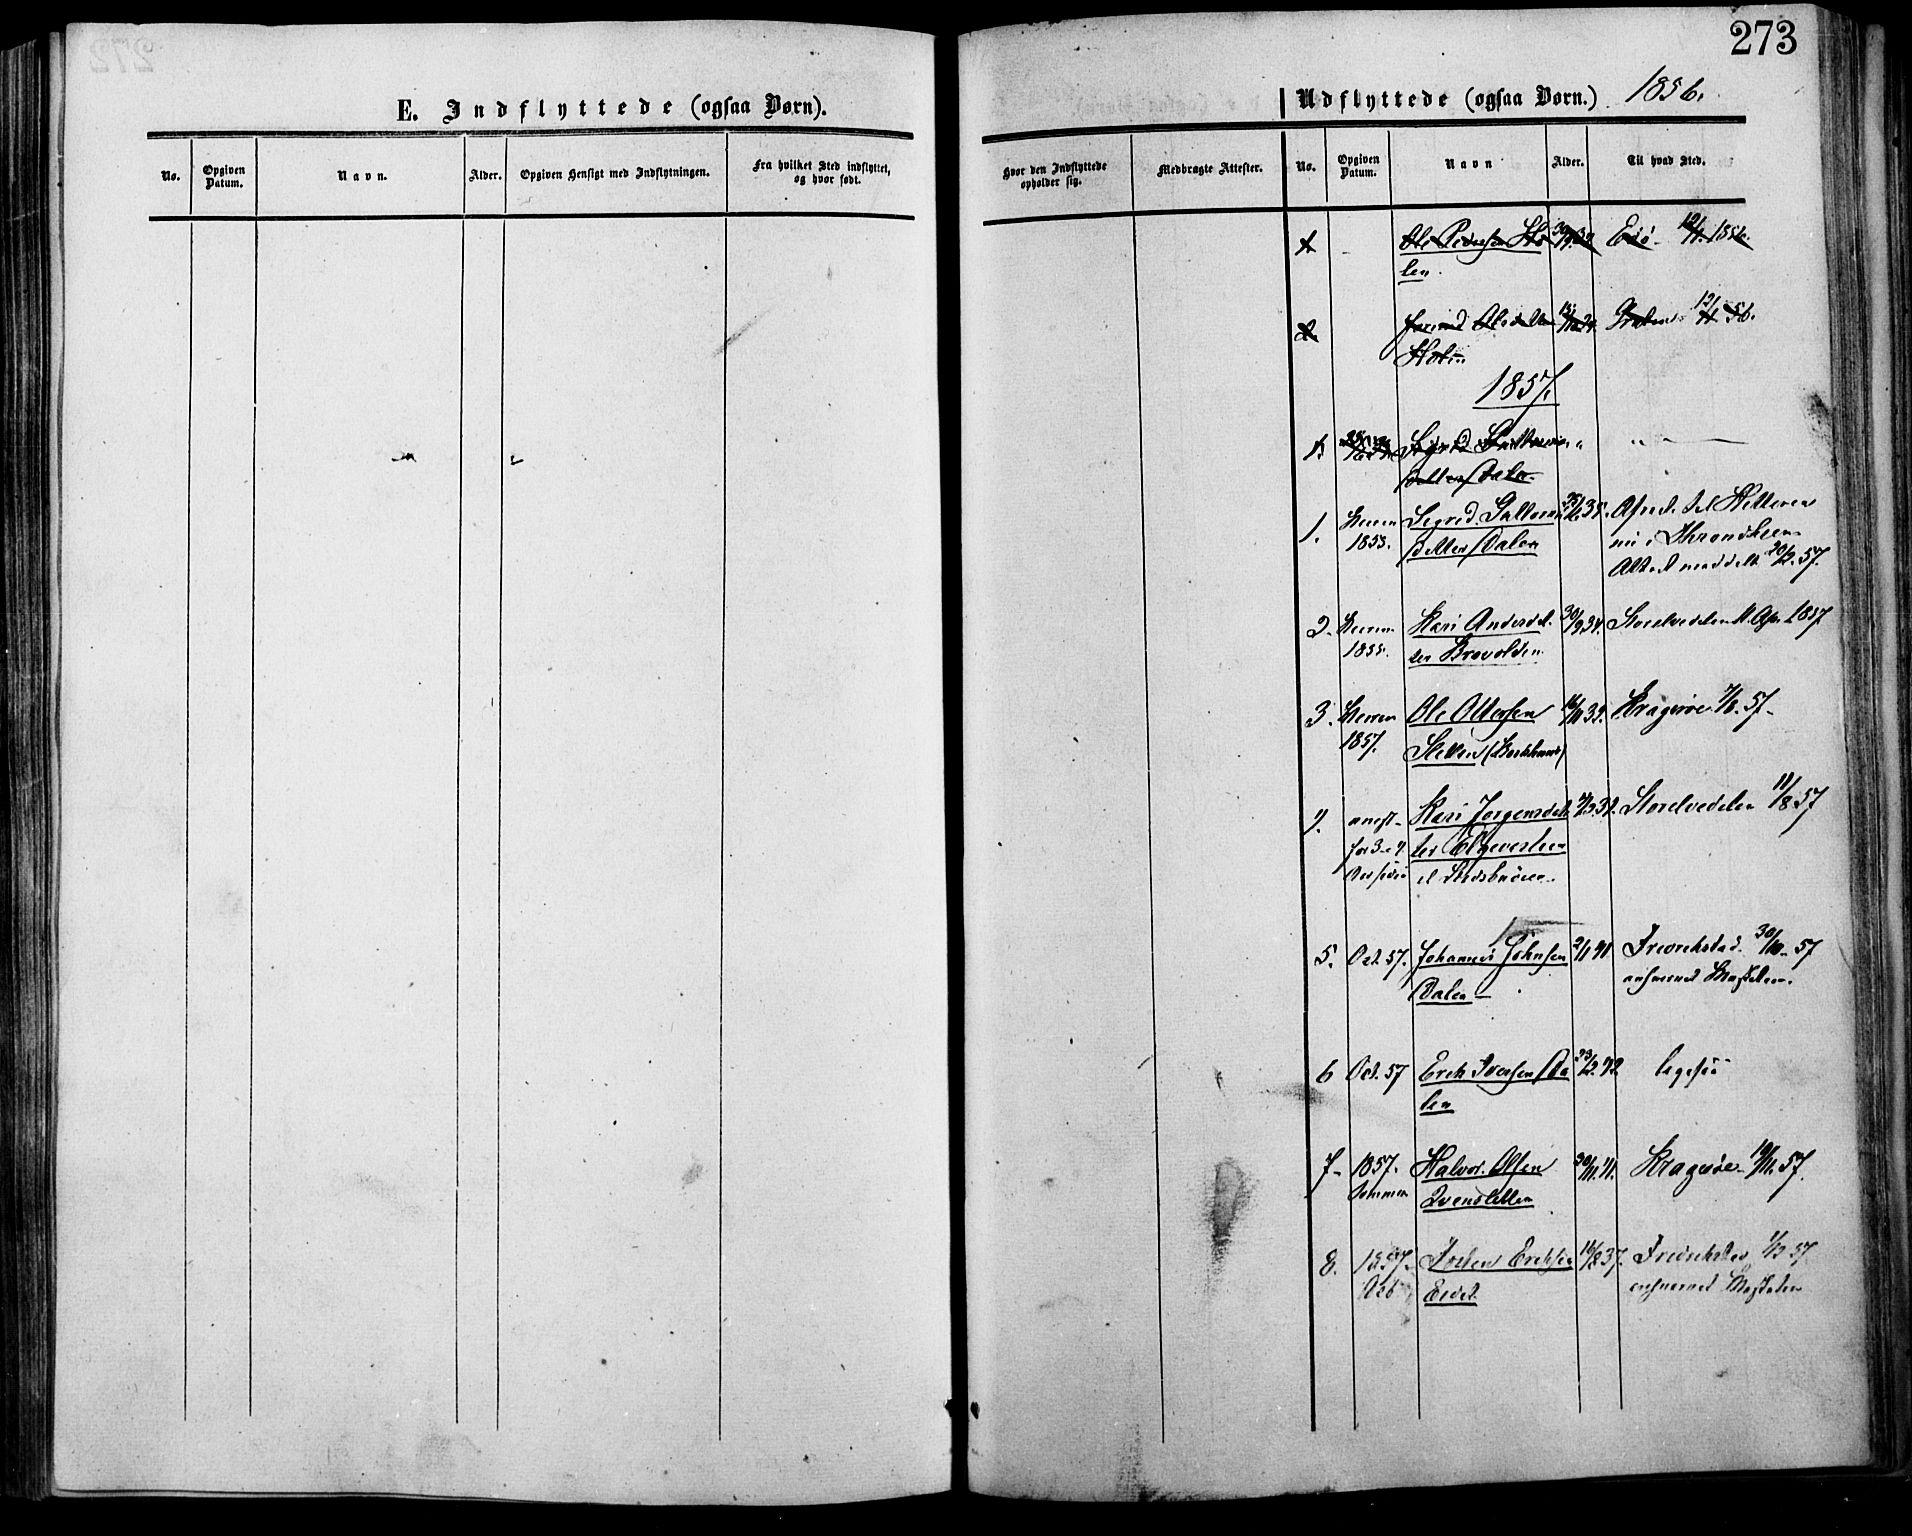 SAH, Lesja prestekontor, Ministerialbok nr. 7, 1854-1862, s. 273